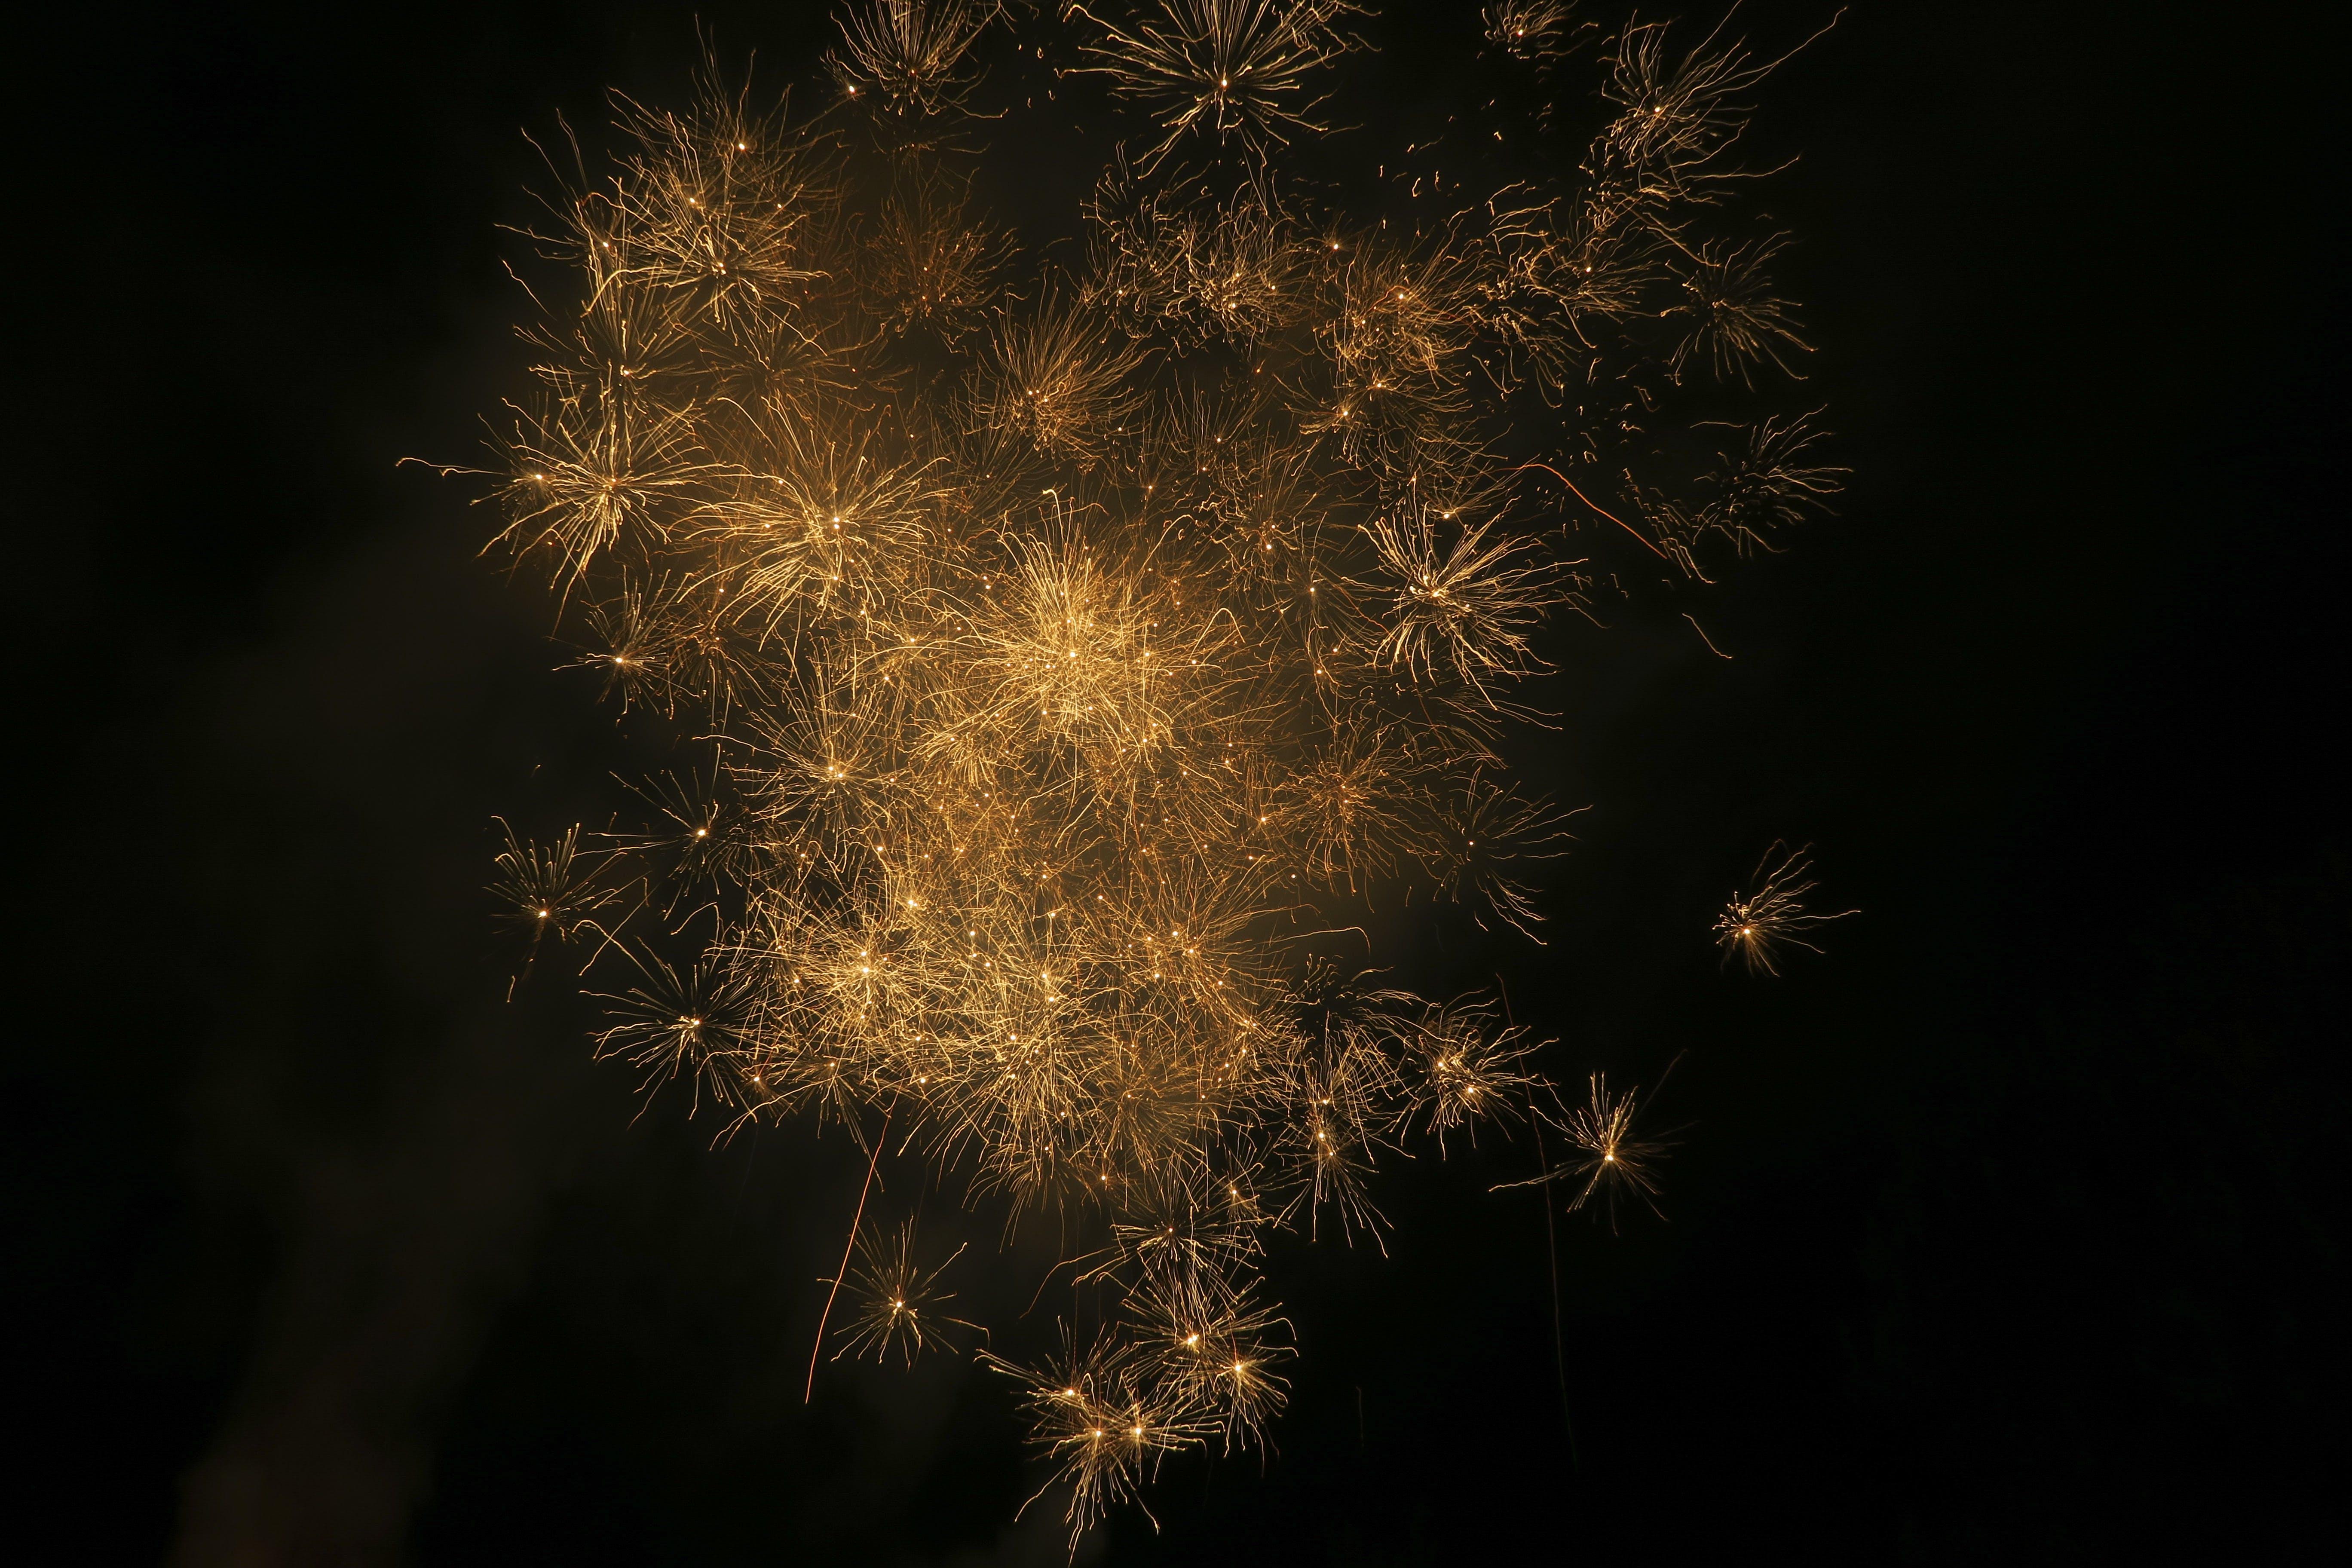 Free stock photo of bonfire, bonfire night, evening sky, explosion